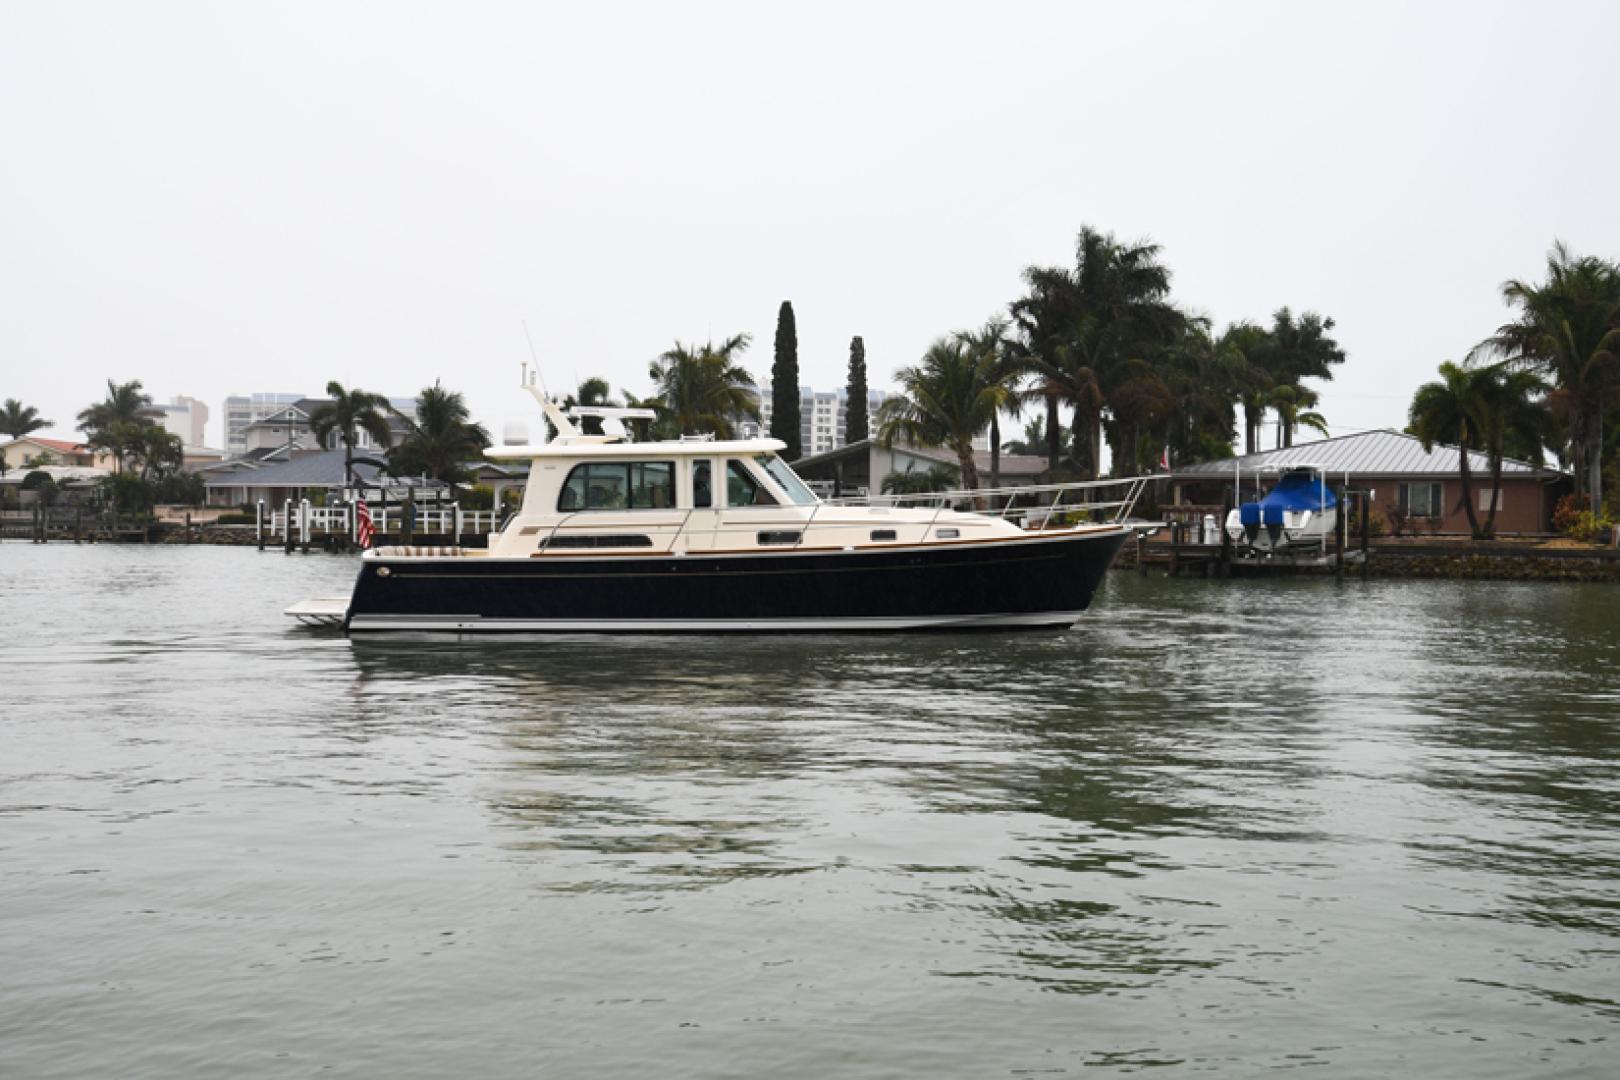 Sabre-40 Express 2010-Impulse Treasure Island-Florida-United States-2010 40 Sabre Express  Impulse  Profile-1618617 | Thumbnail